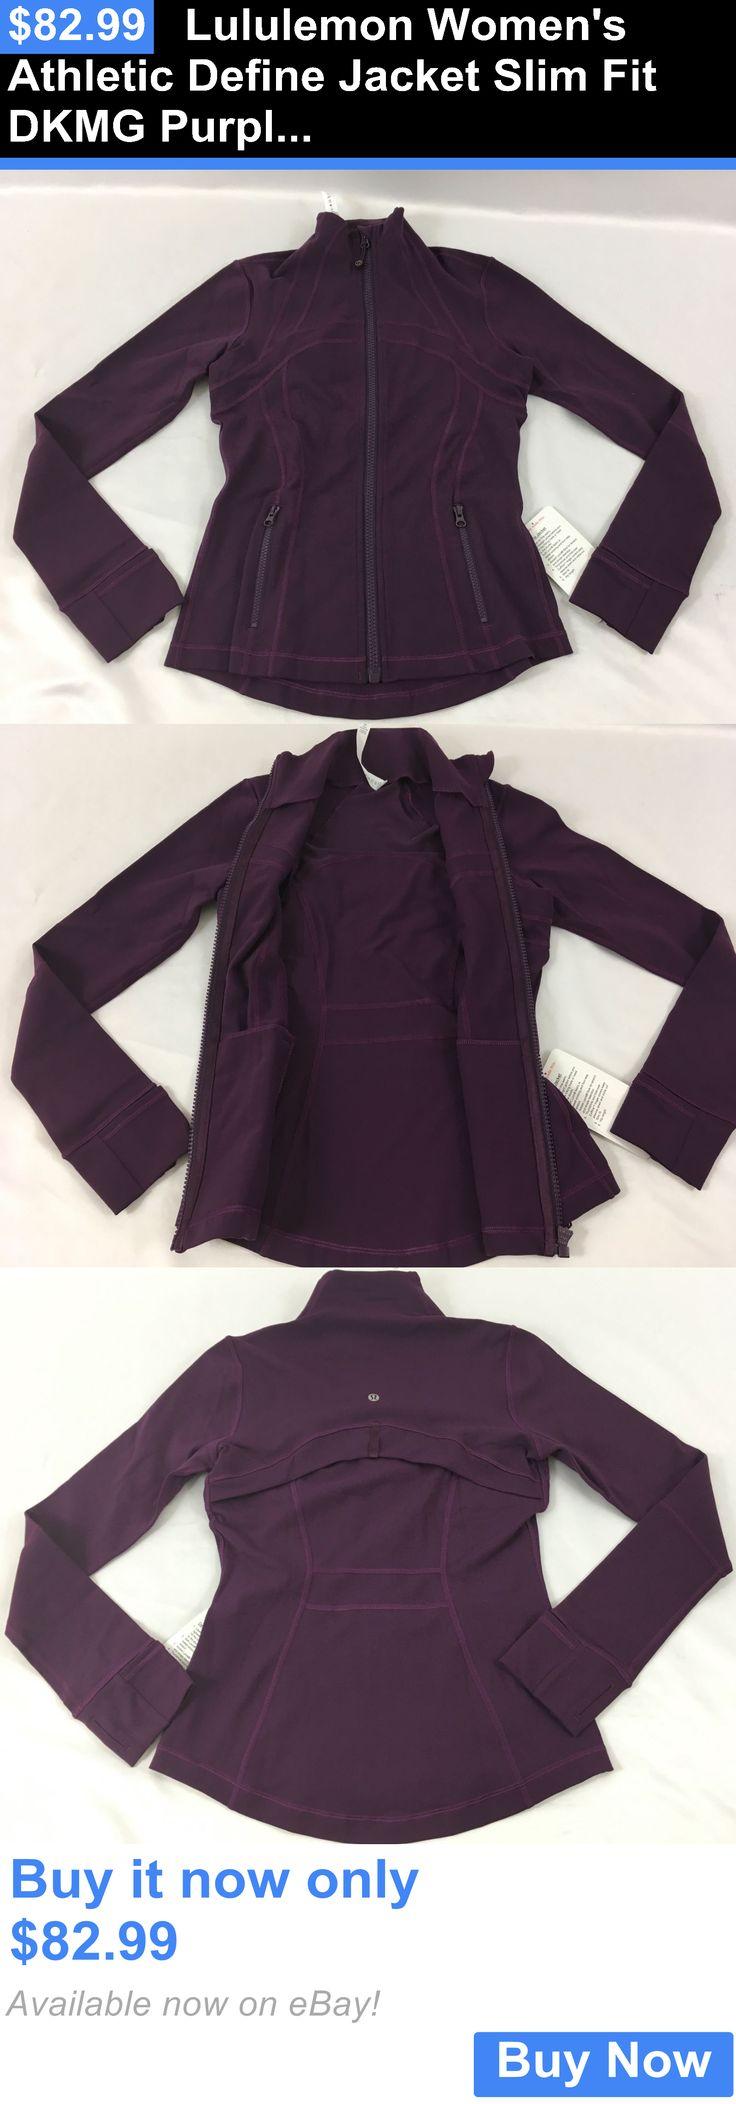 Women Athletics: Lululemon Womens Athletic Define Jacket Slim Fit Dkmg Purple Size 6 BUY IT NOW ONLY: $82.99